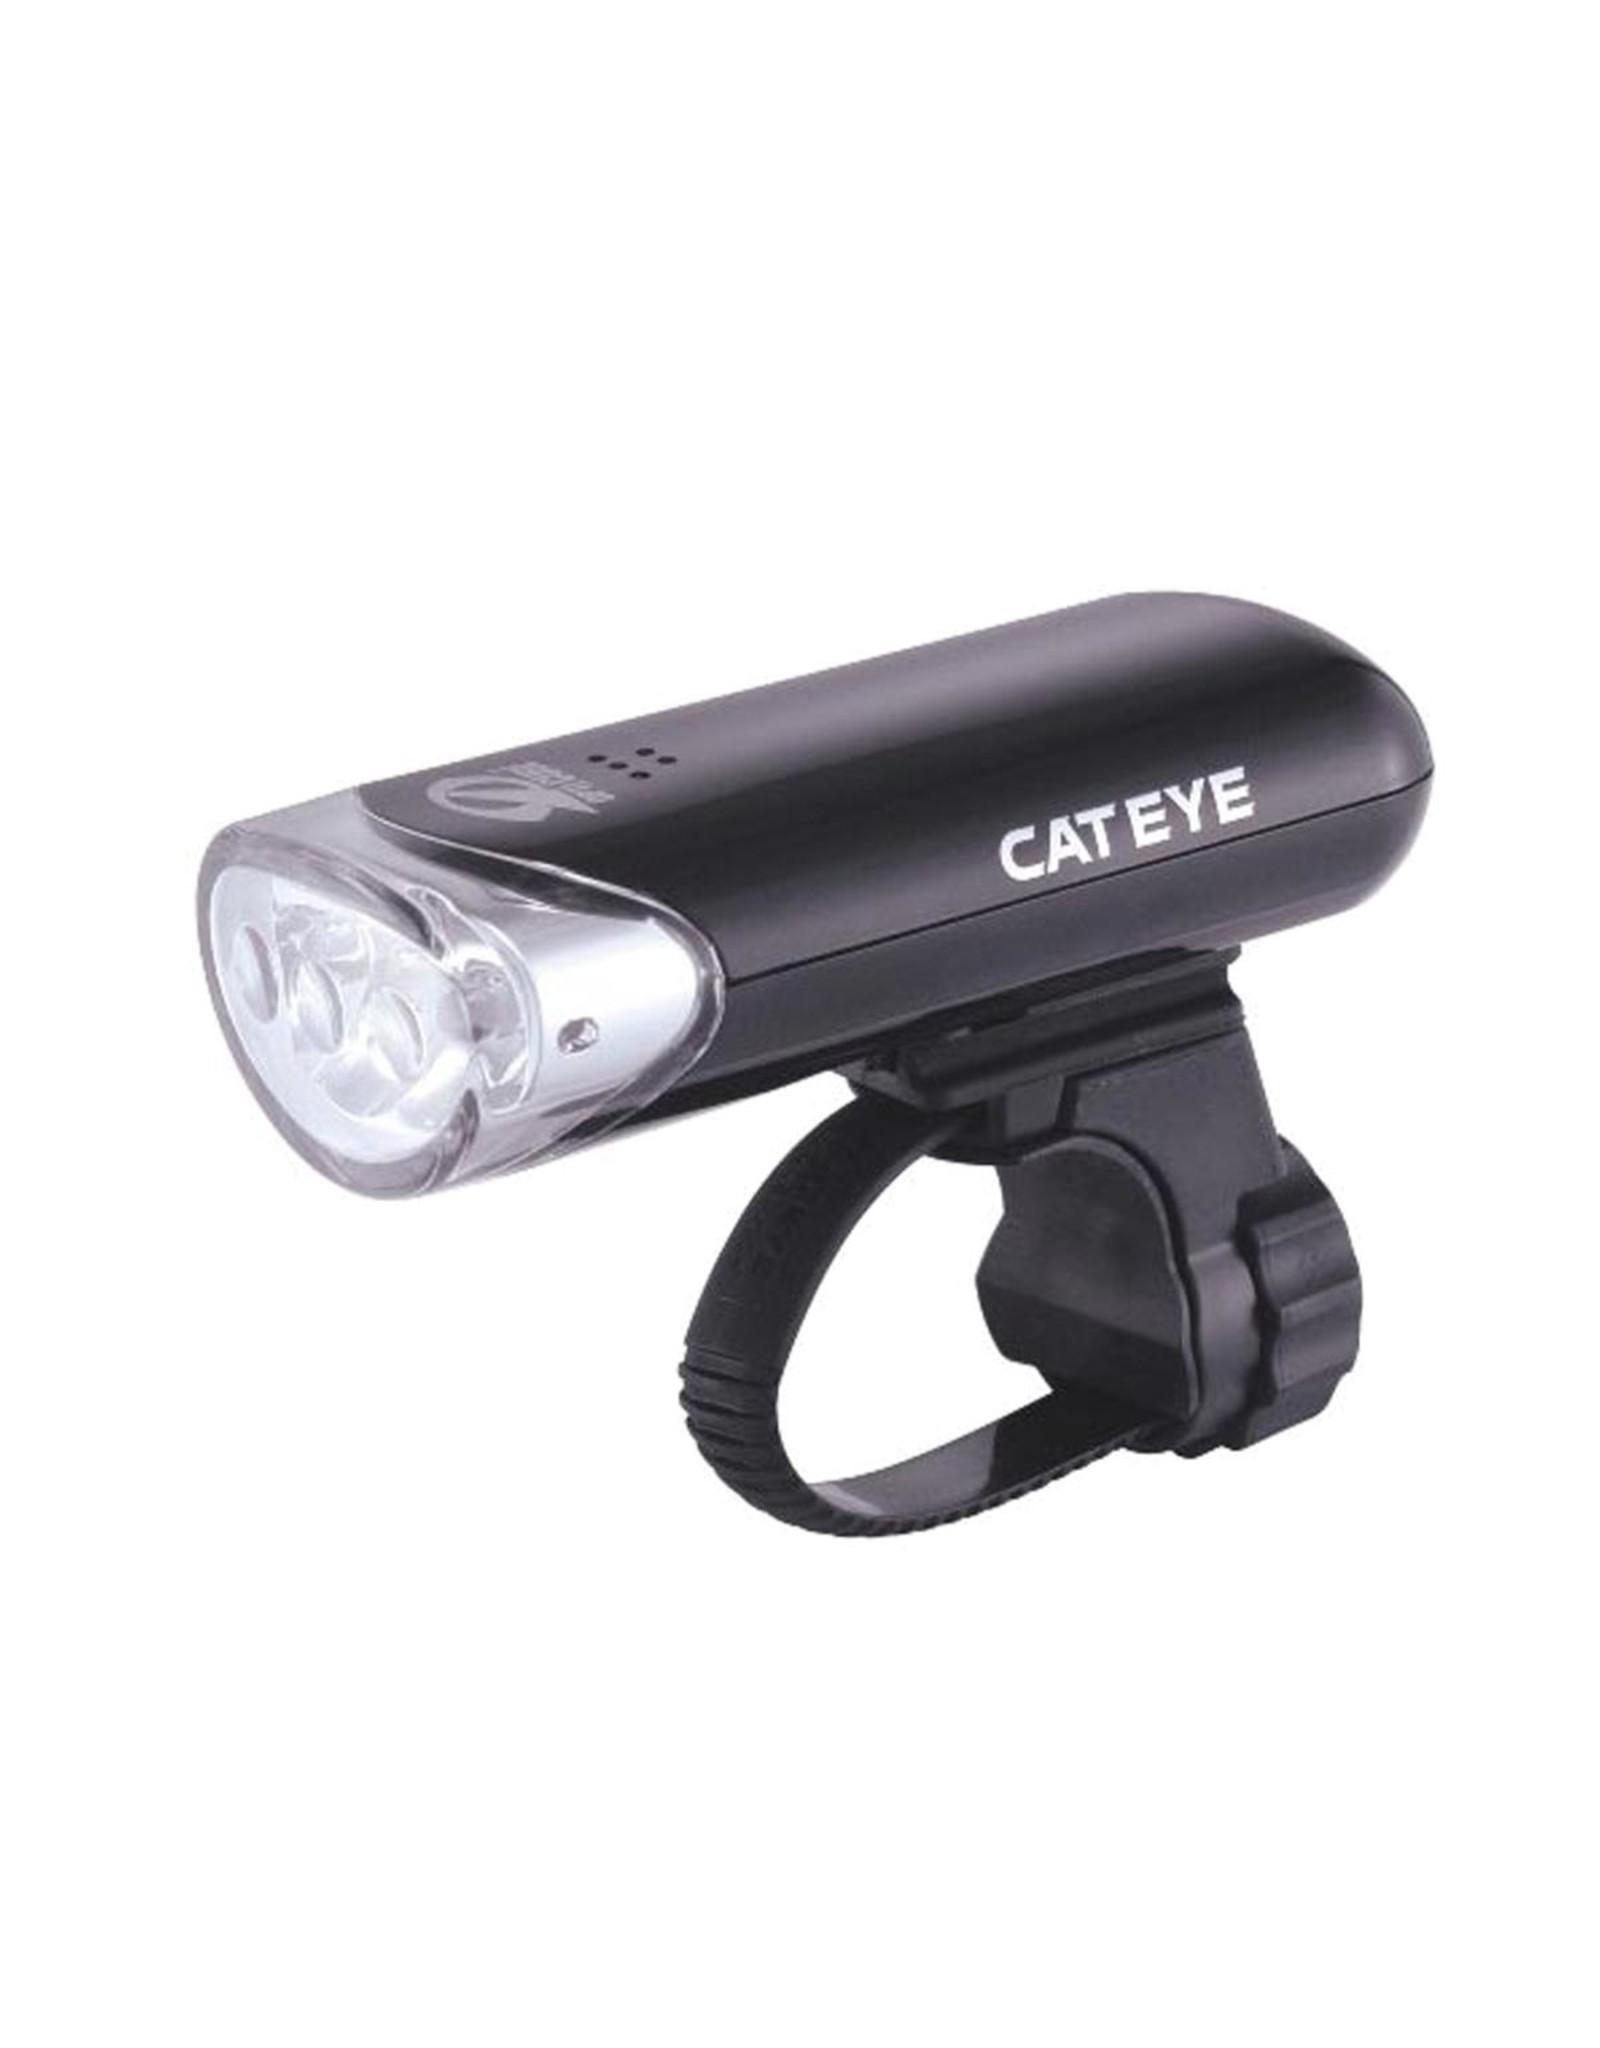 Cateye Front Light EL135 3 LED